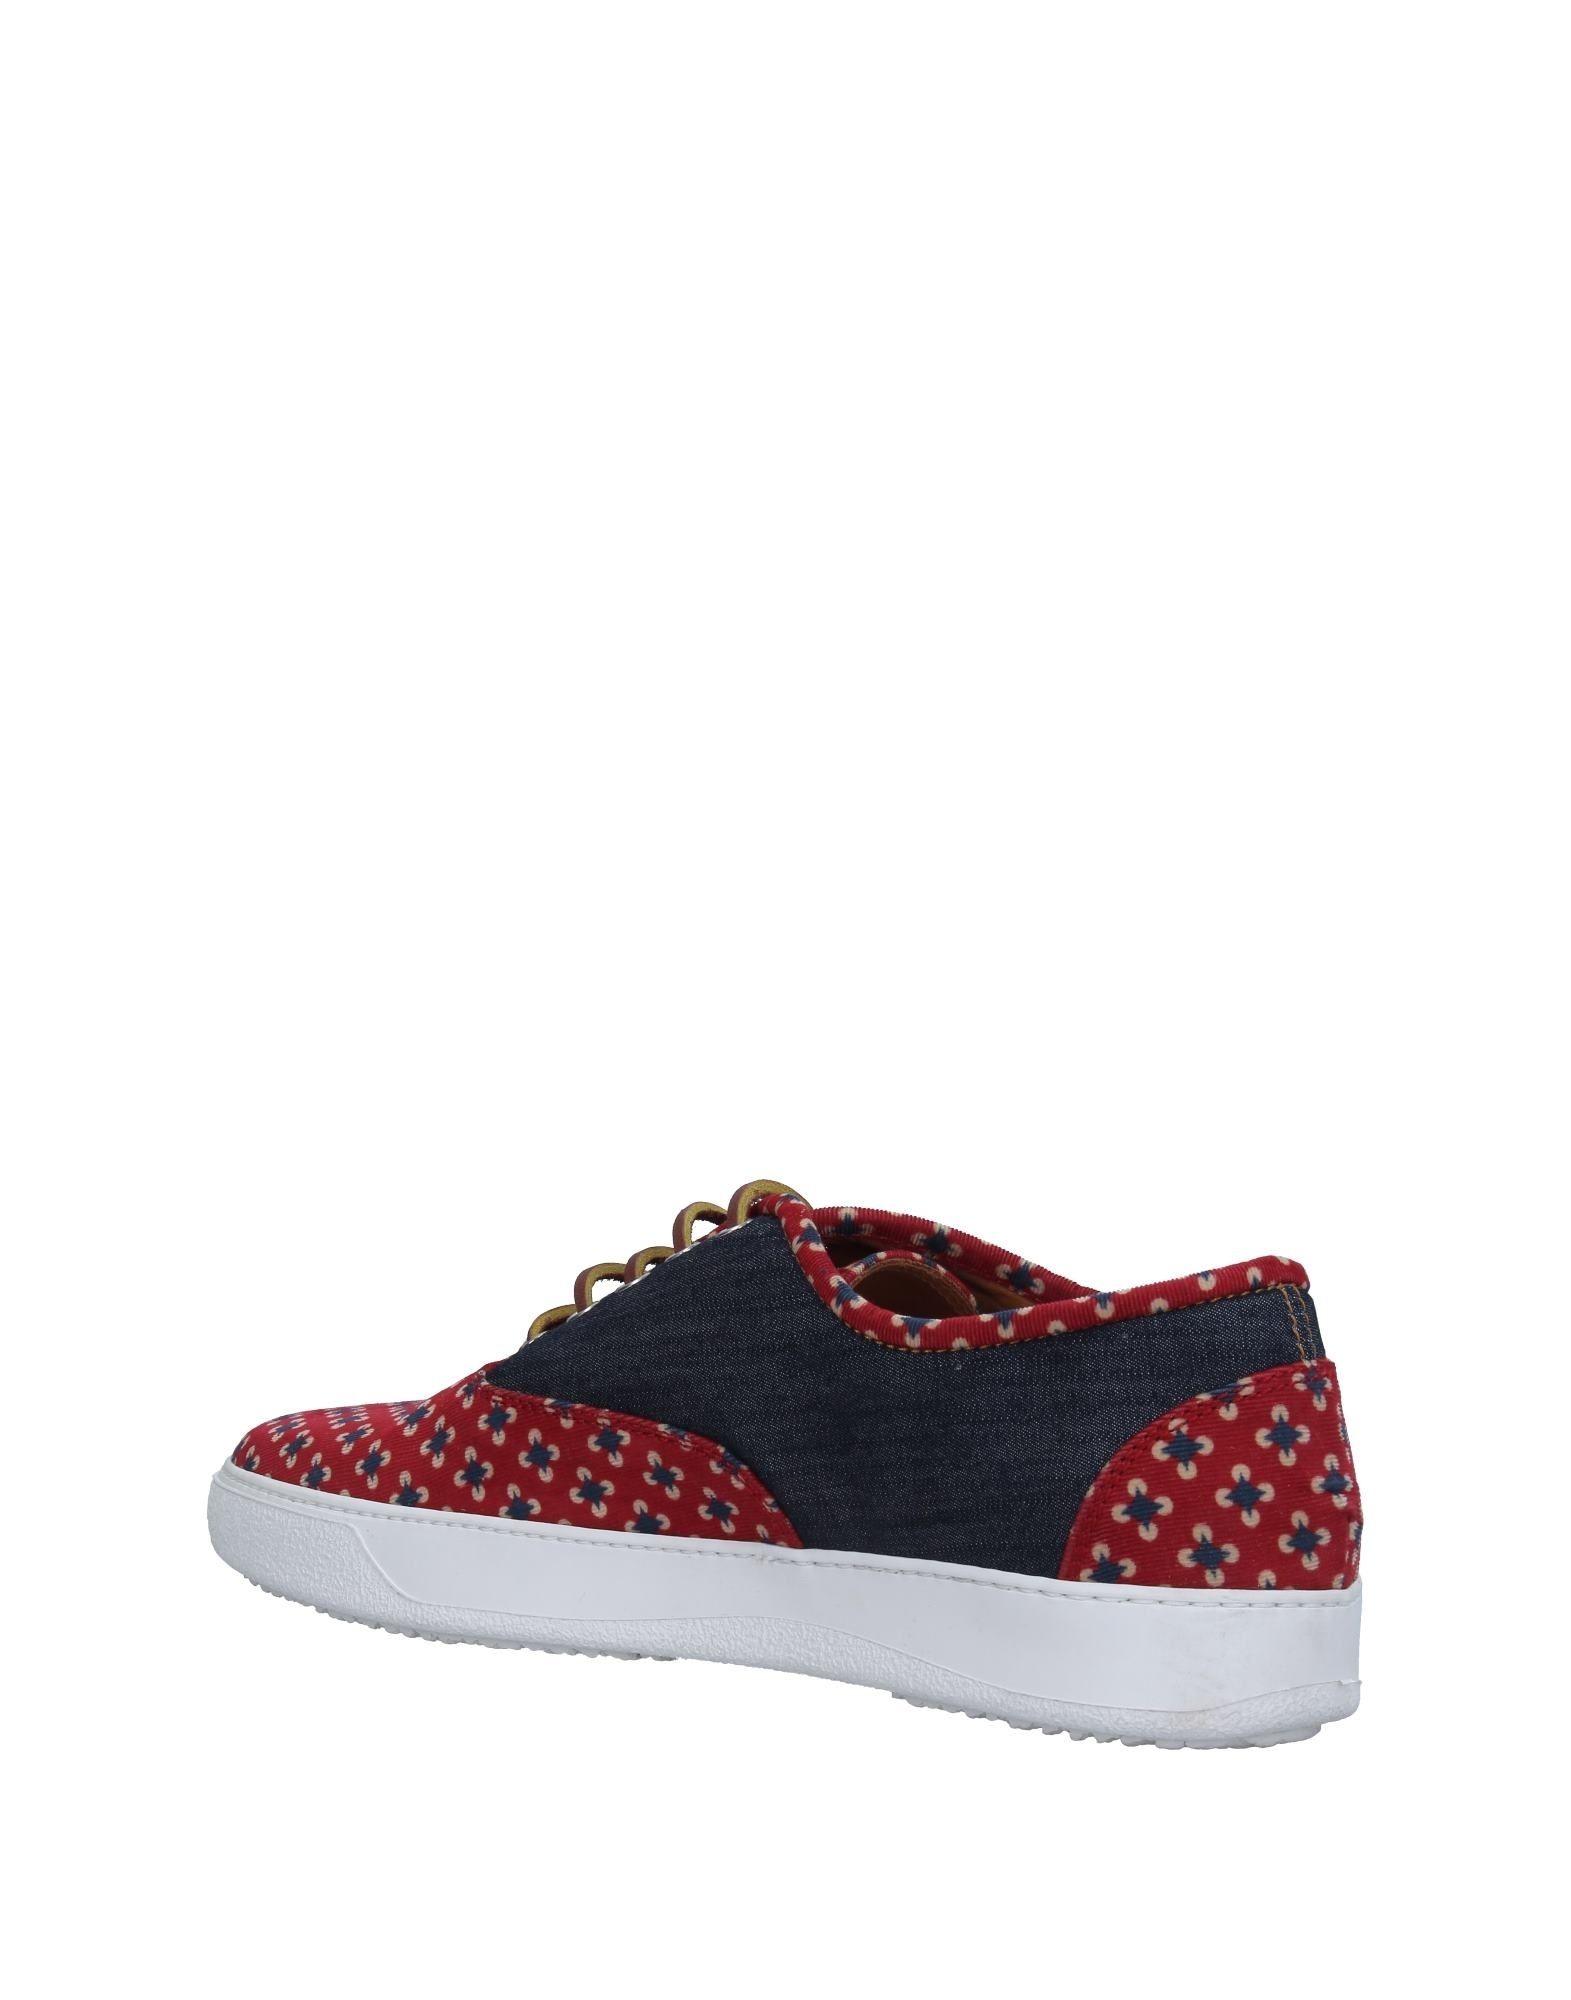 Dsquared2 Sneakers Herren  beliebte 11319965EF Gute Qualität beliebte  Schuhe d5b05d